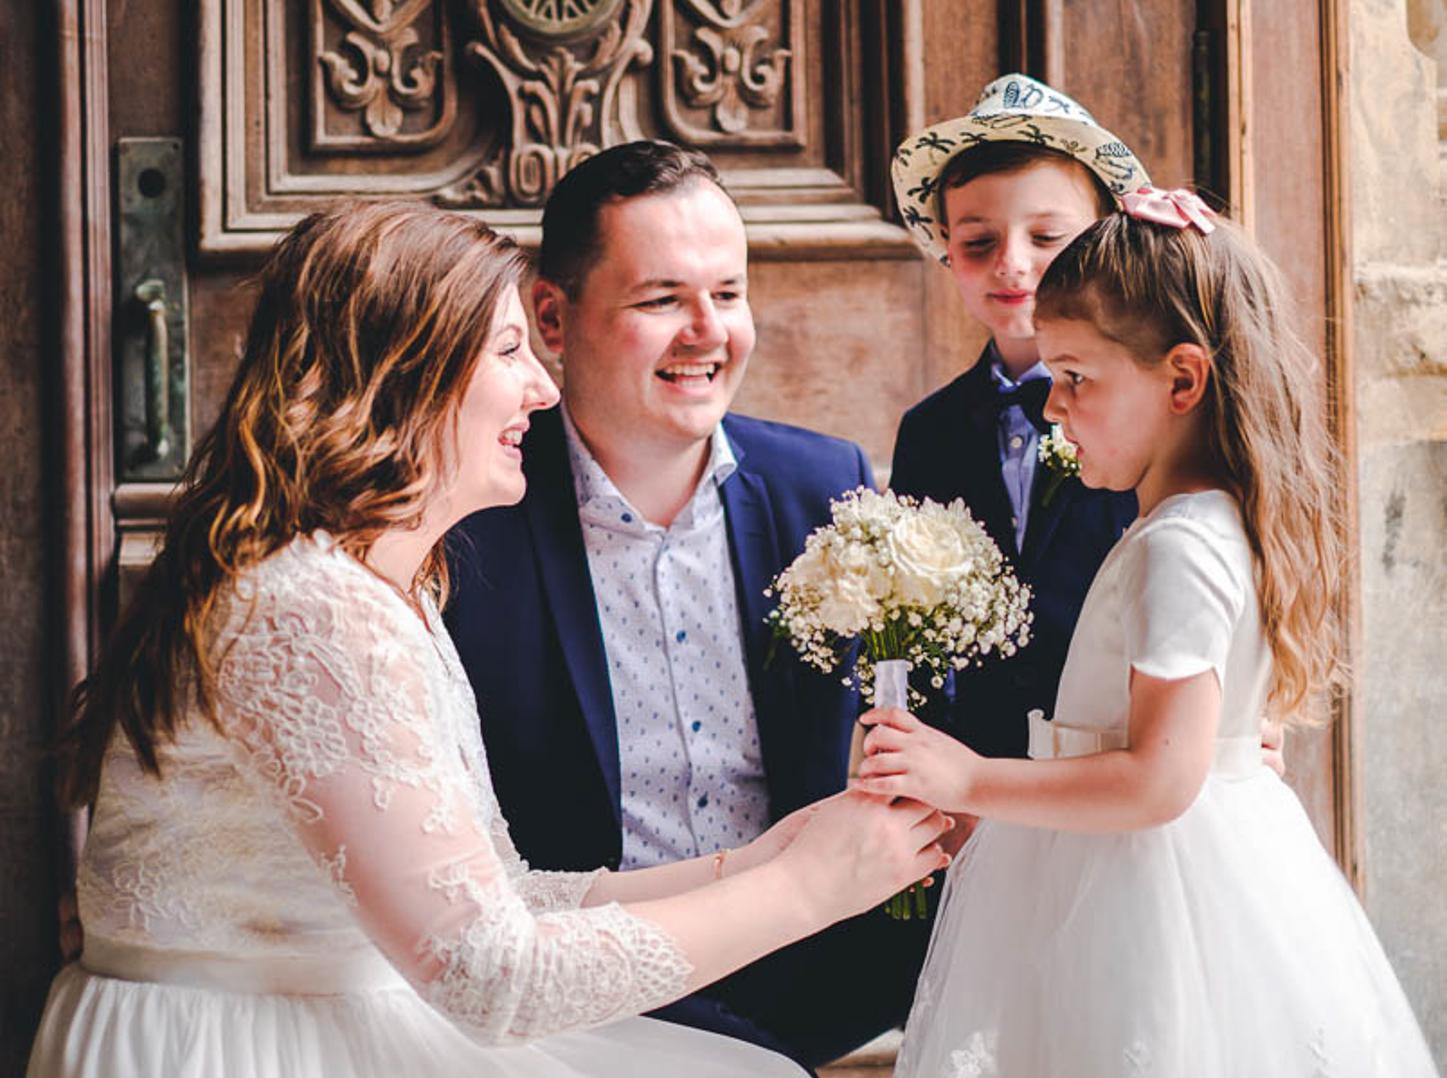 bodas-sin-clasificar-sin-tema-cuba-42292.jpg